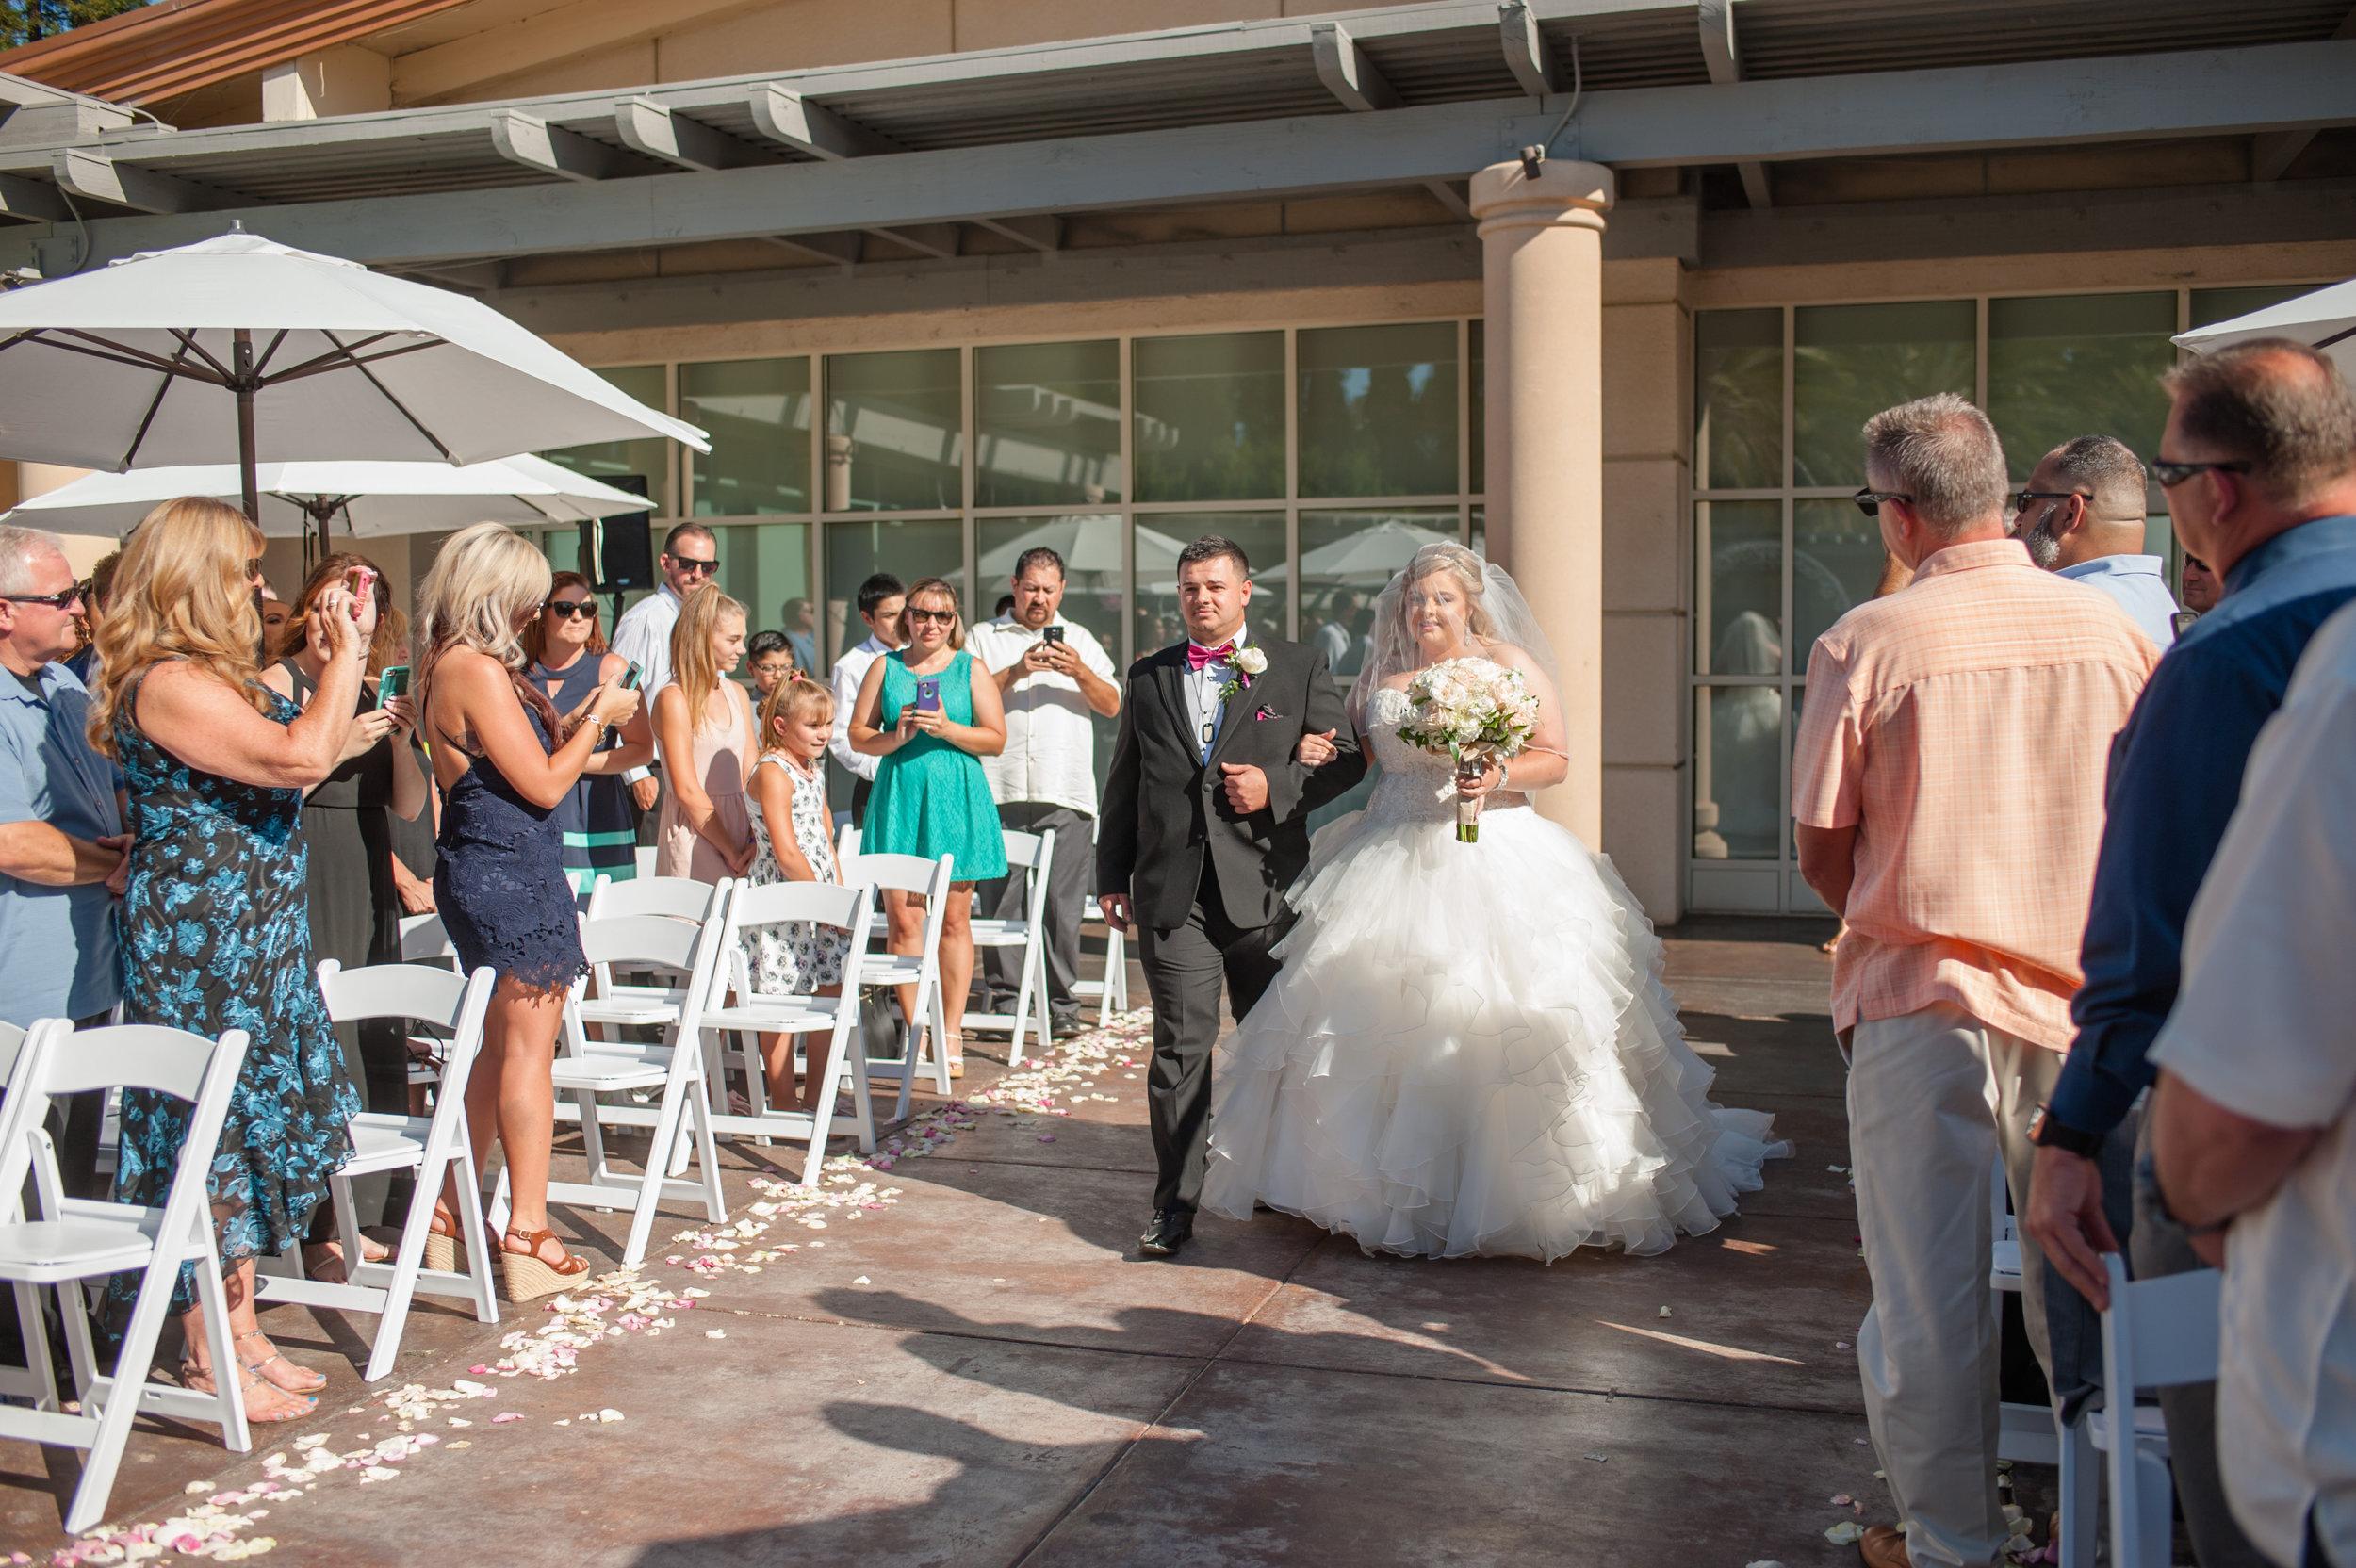 lyndzie-javier-012-arden-hills-sacramento-wedding-photographer-katherine-nicole-photography.JPG